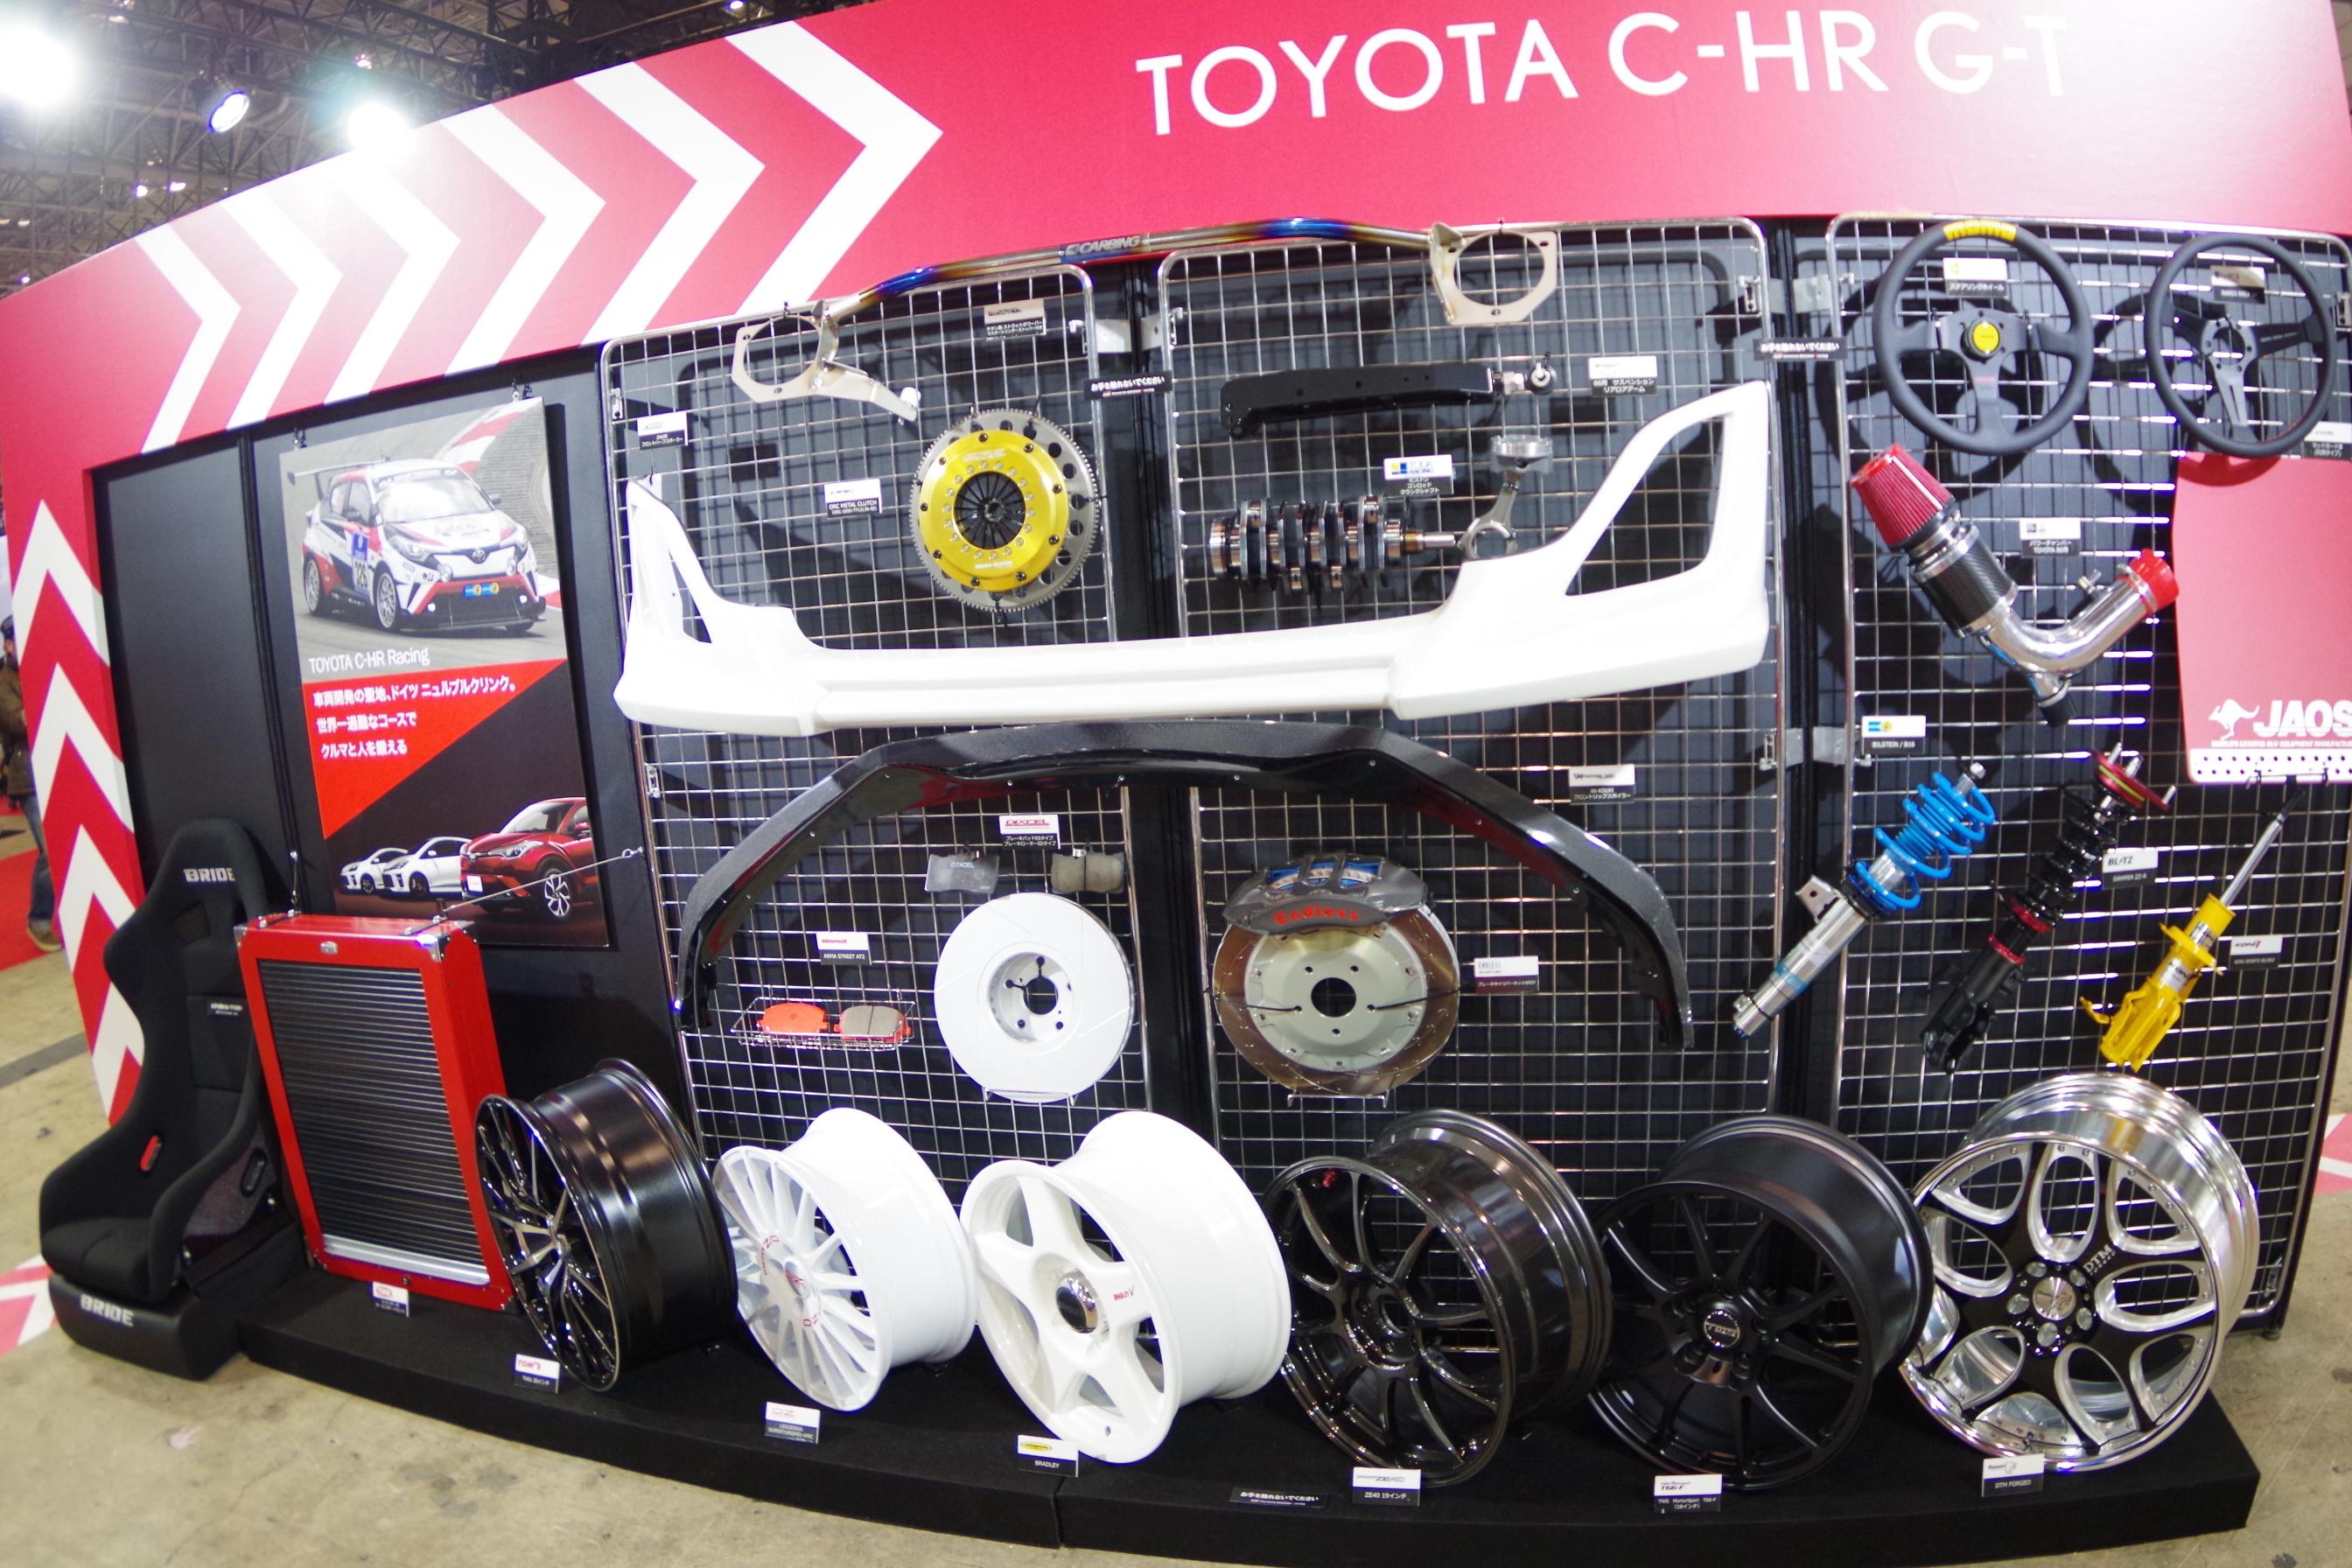 Toyota c-hr gt トヨタ C-HR GT カスタムパーツ 東京オートサロン